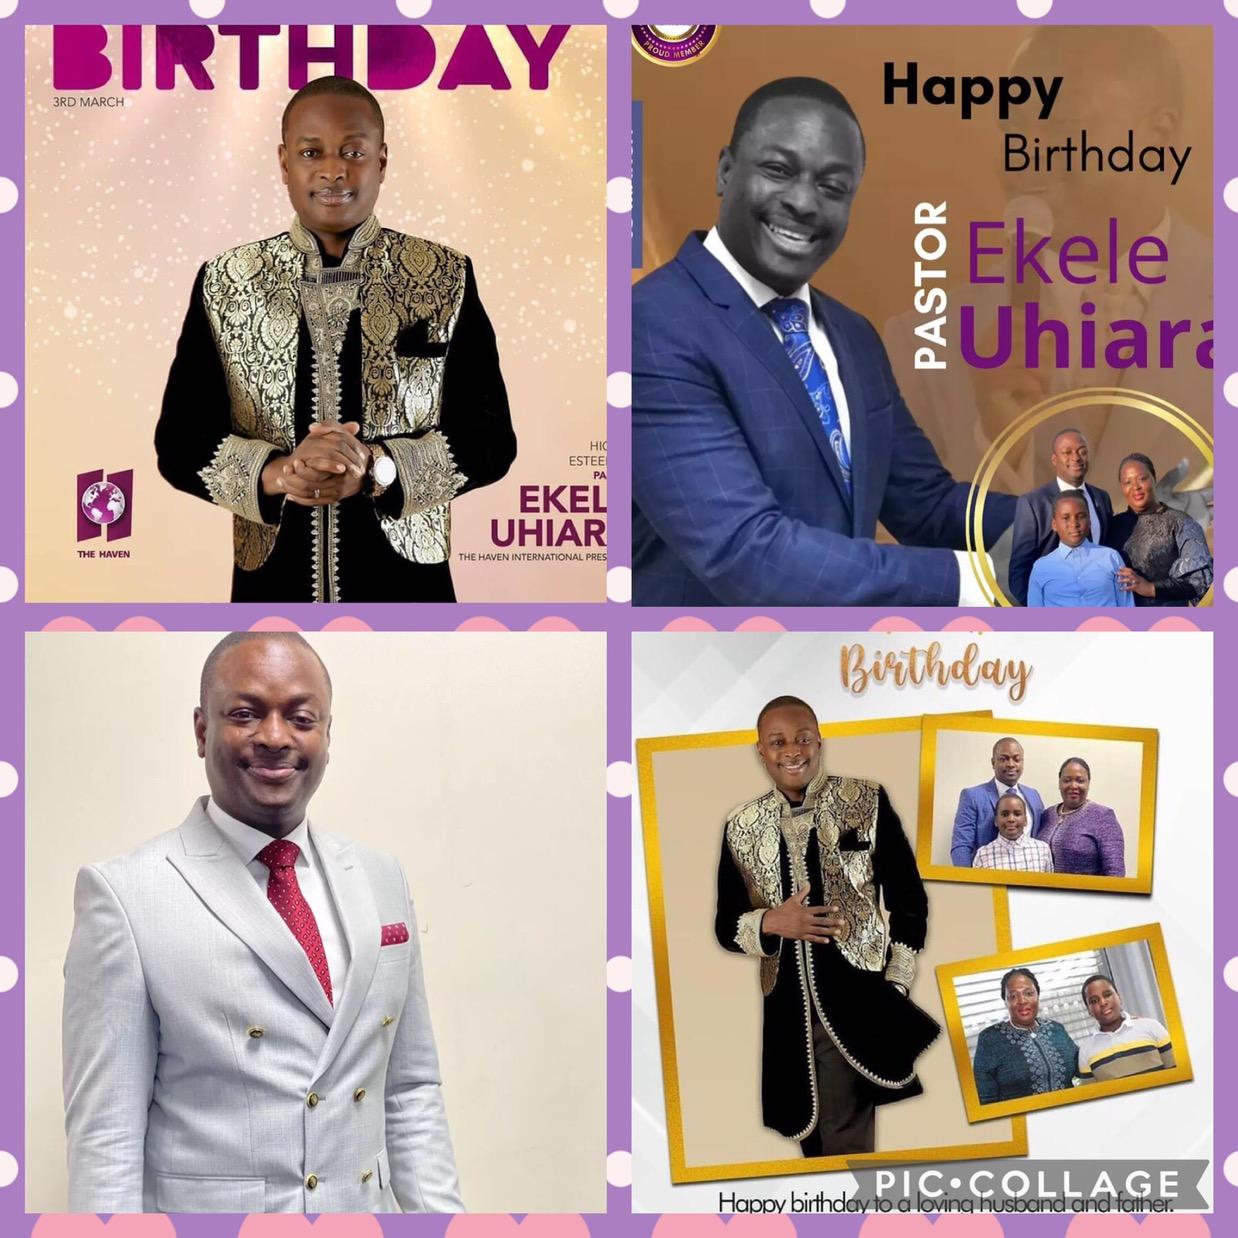 Still celebrating Pastor Ekele, the